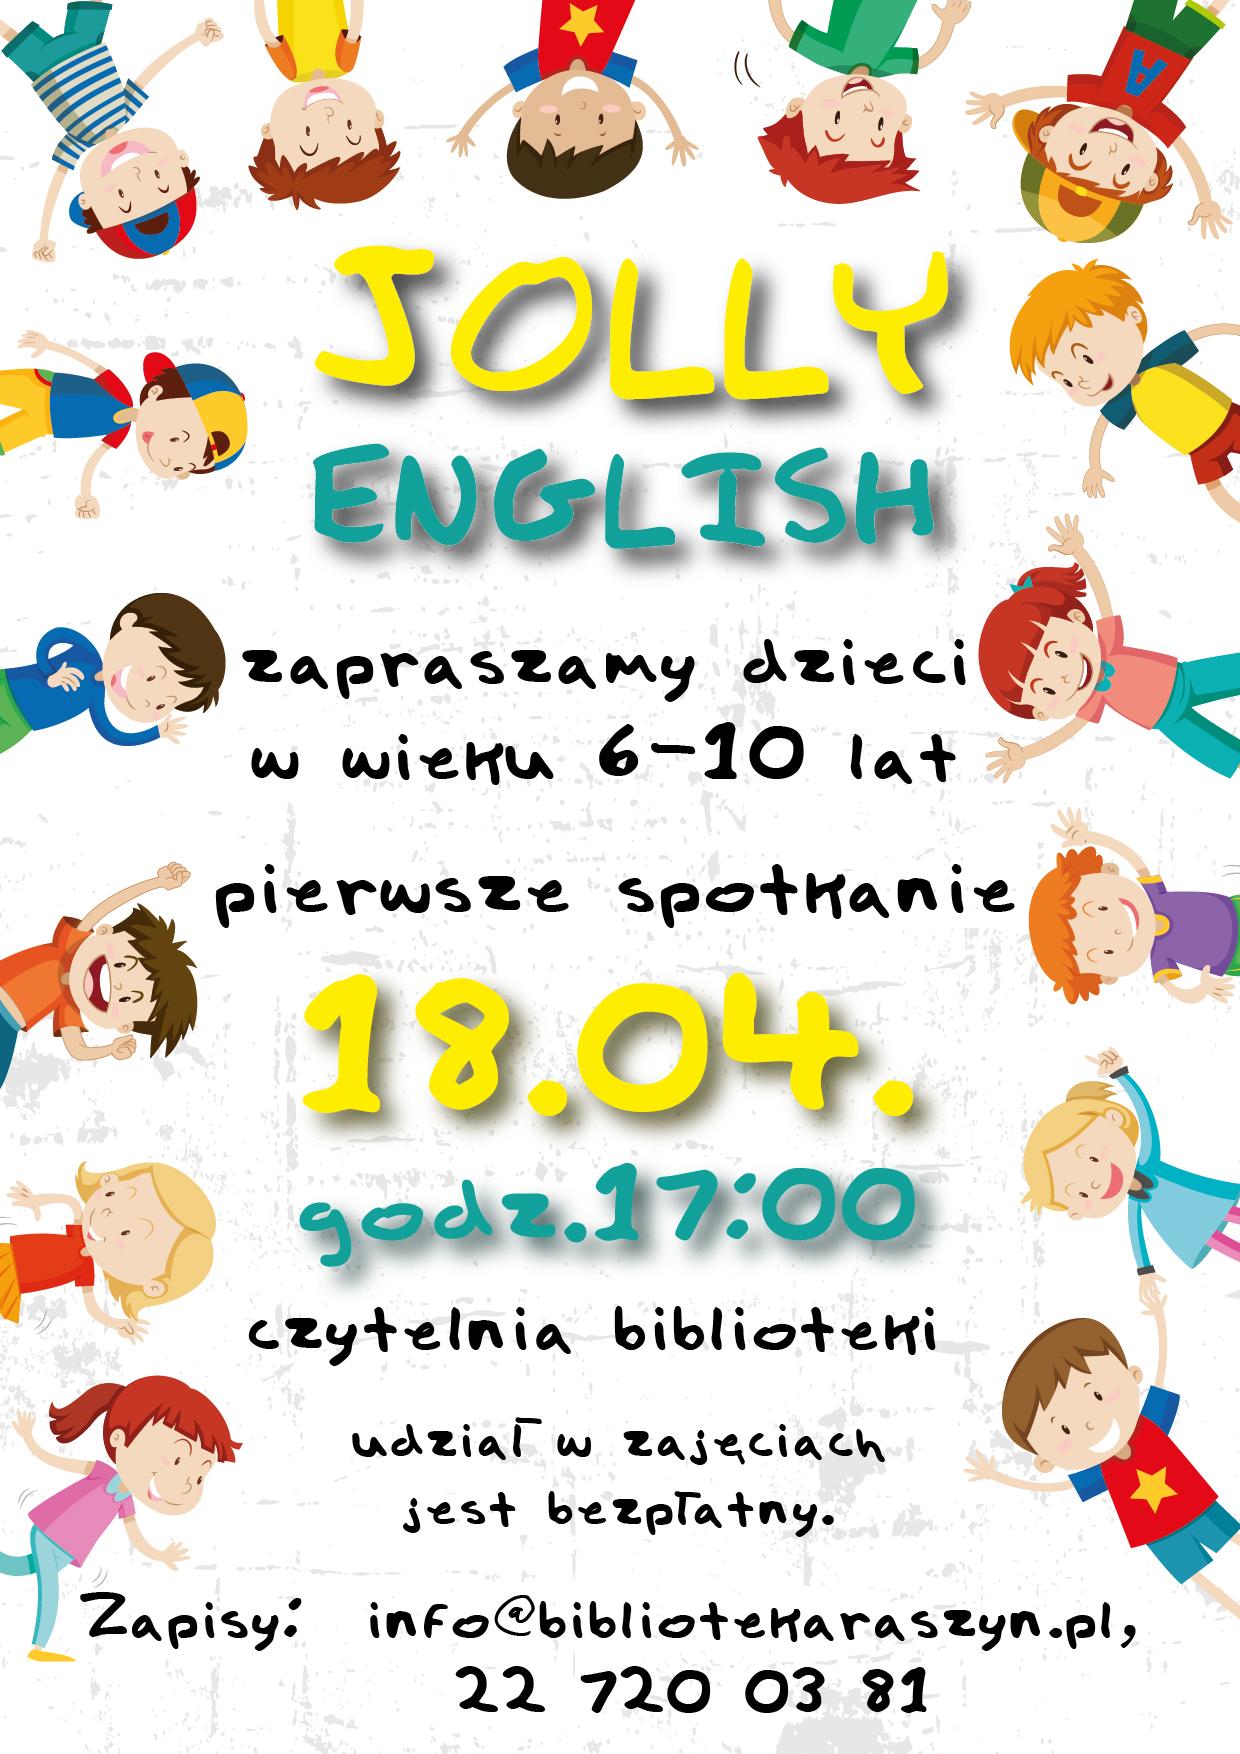 jolly-english-01